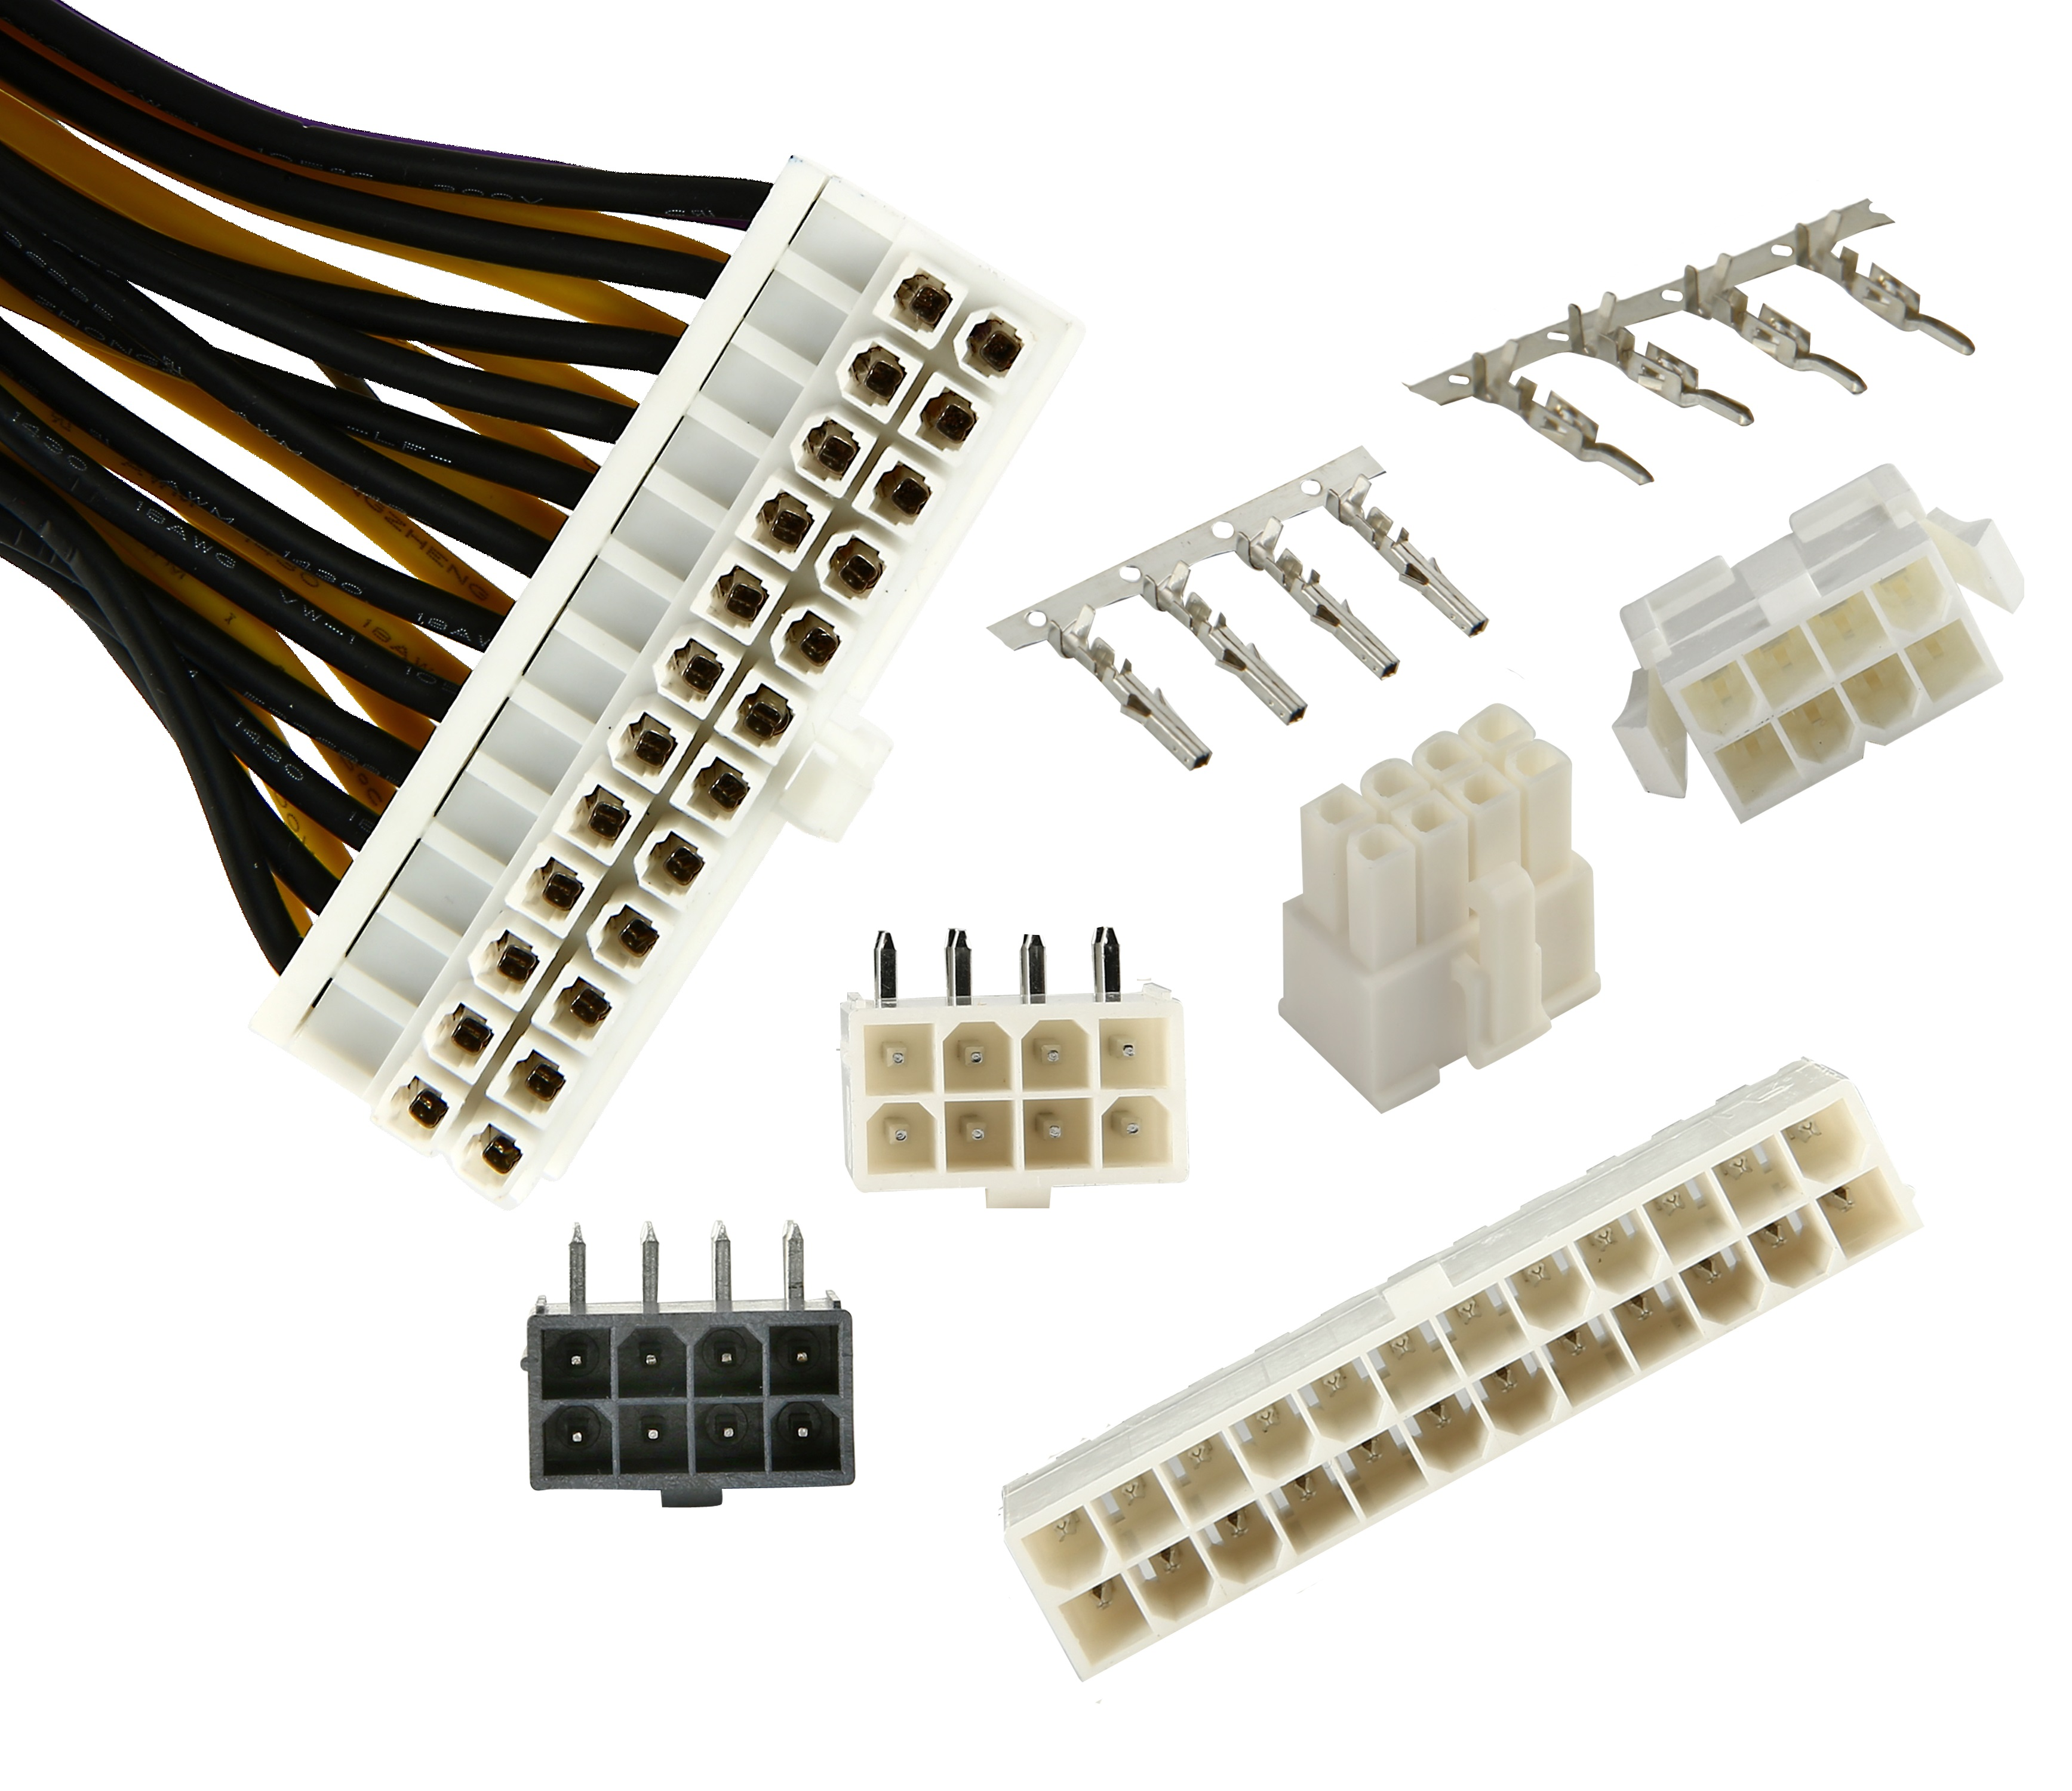 FCI Unveils Minitek Pwr™ 3.0 & Minitek Pwr™ 4.2  Wire-to-Board and Wire-to-Wire Connectors